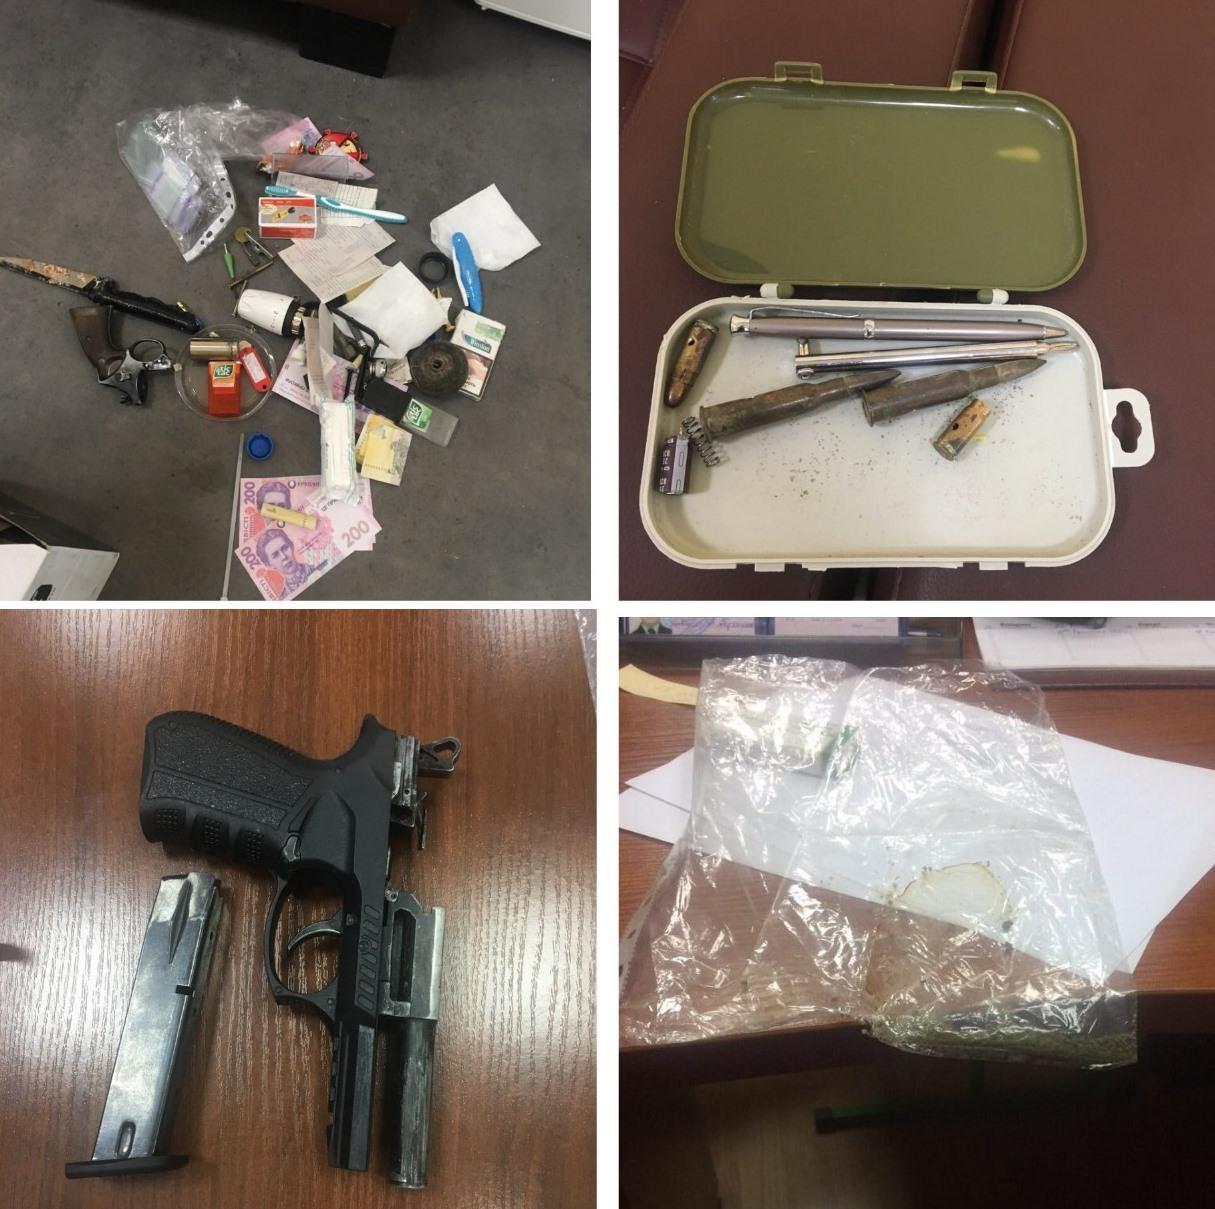 Замдиректора гимназии хранил на кабинете оружие и наркотики. Фото: источник Информатора